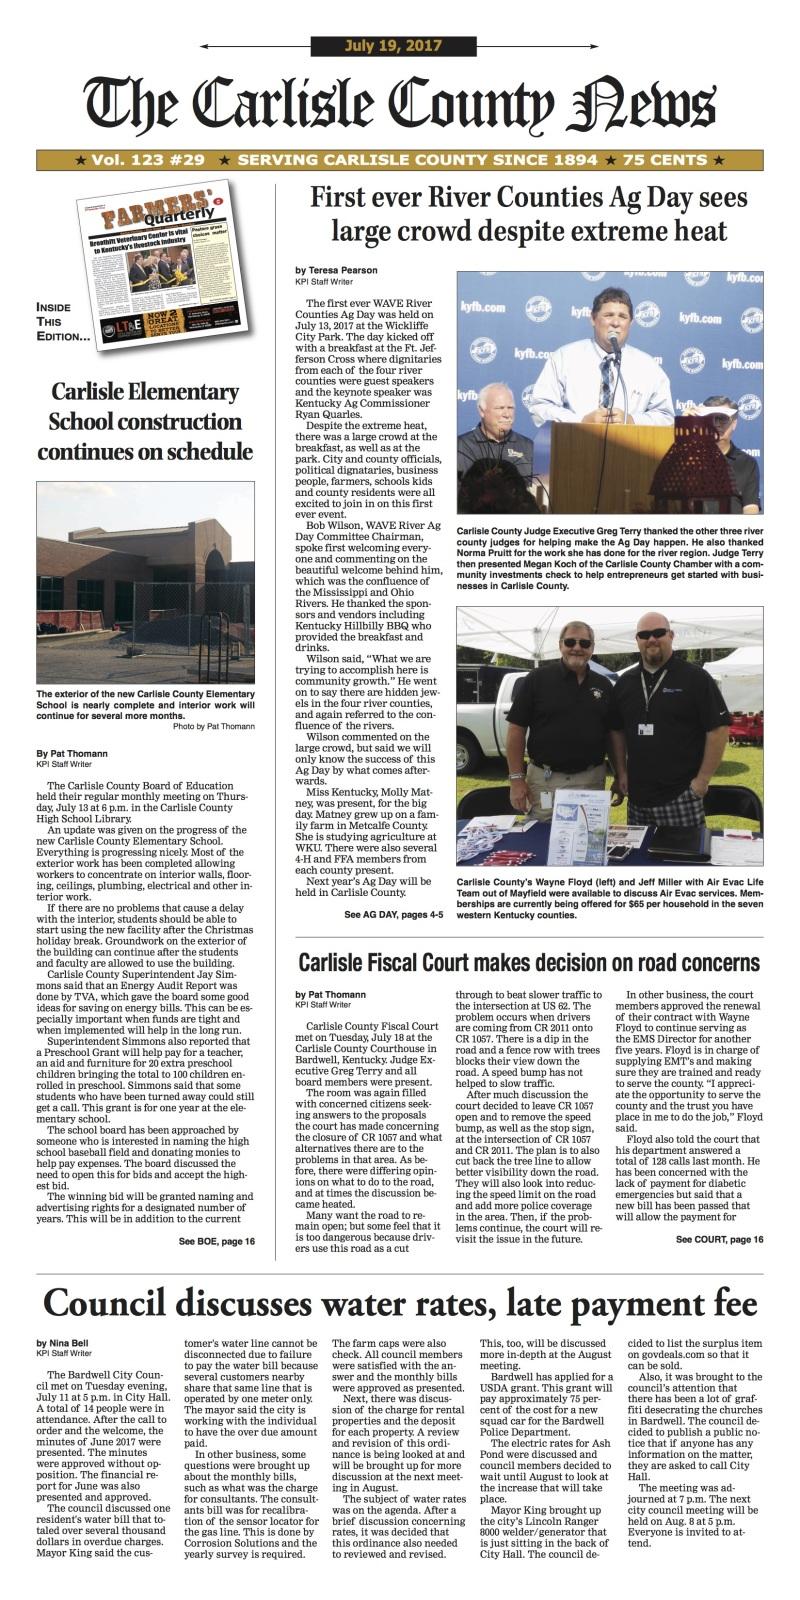 Carlisle County News 7-19-17